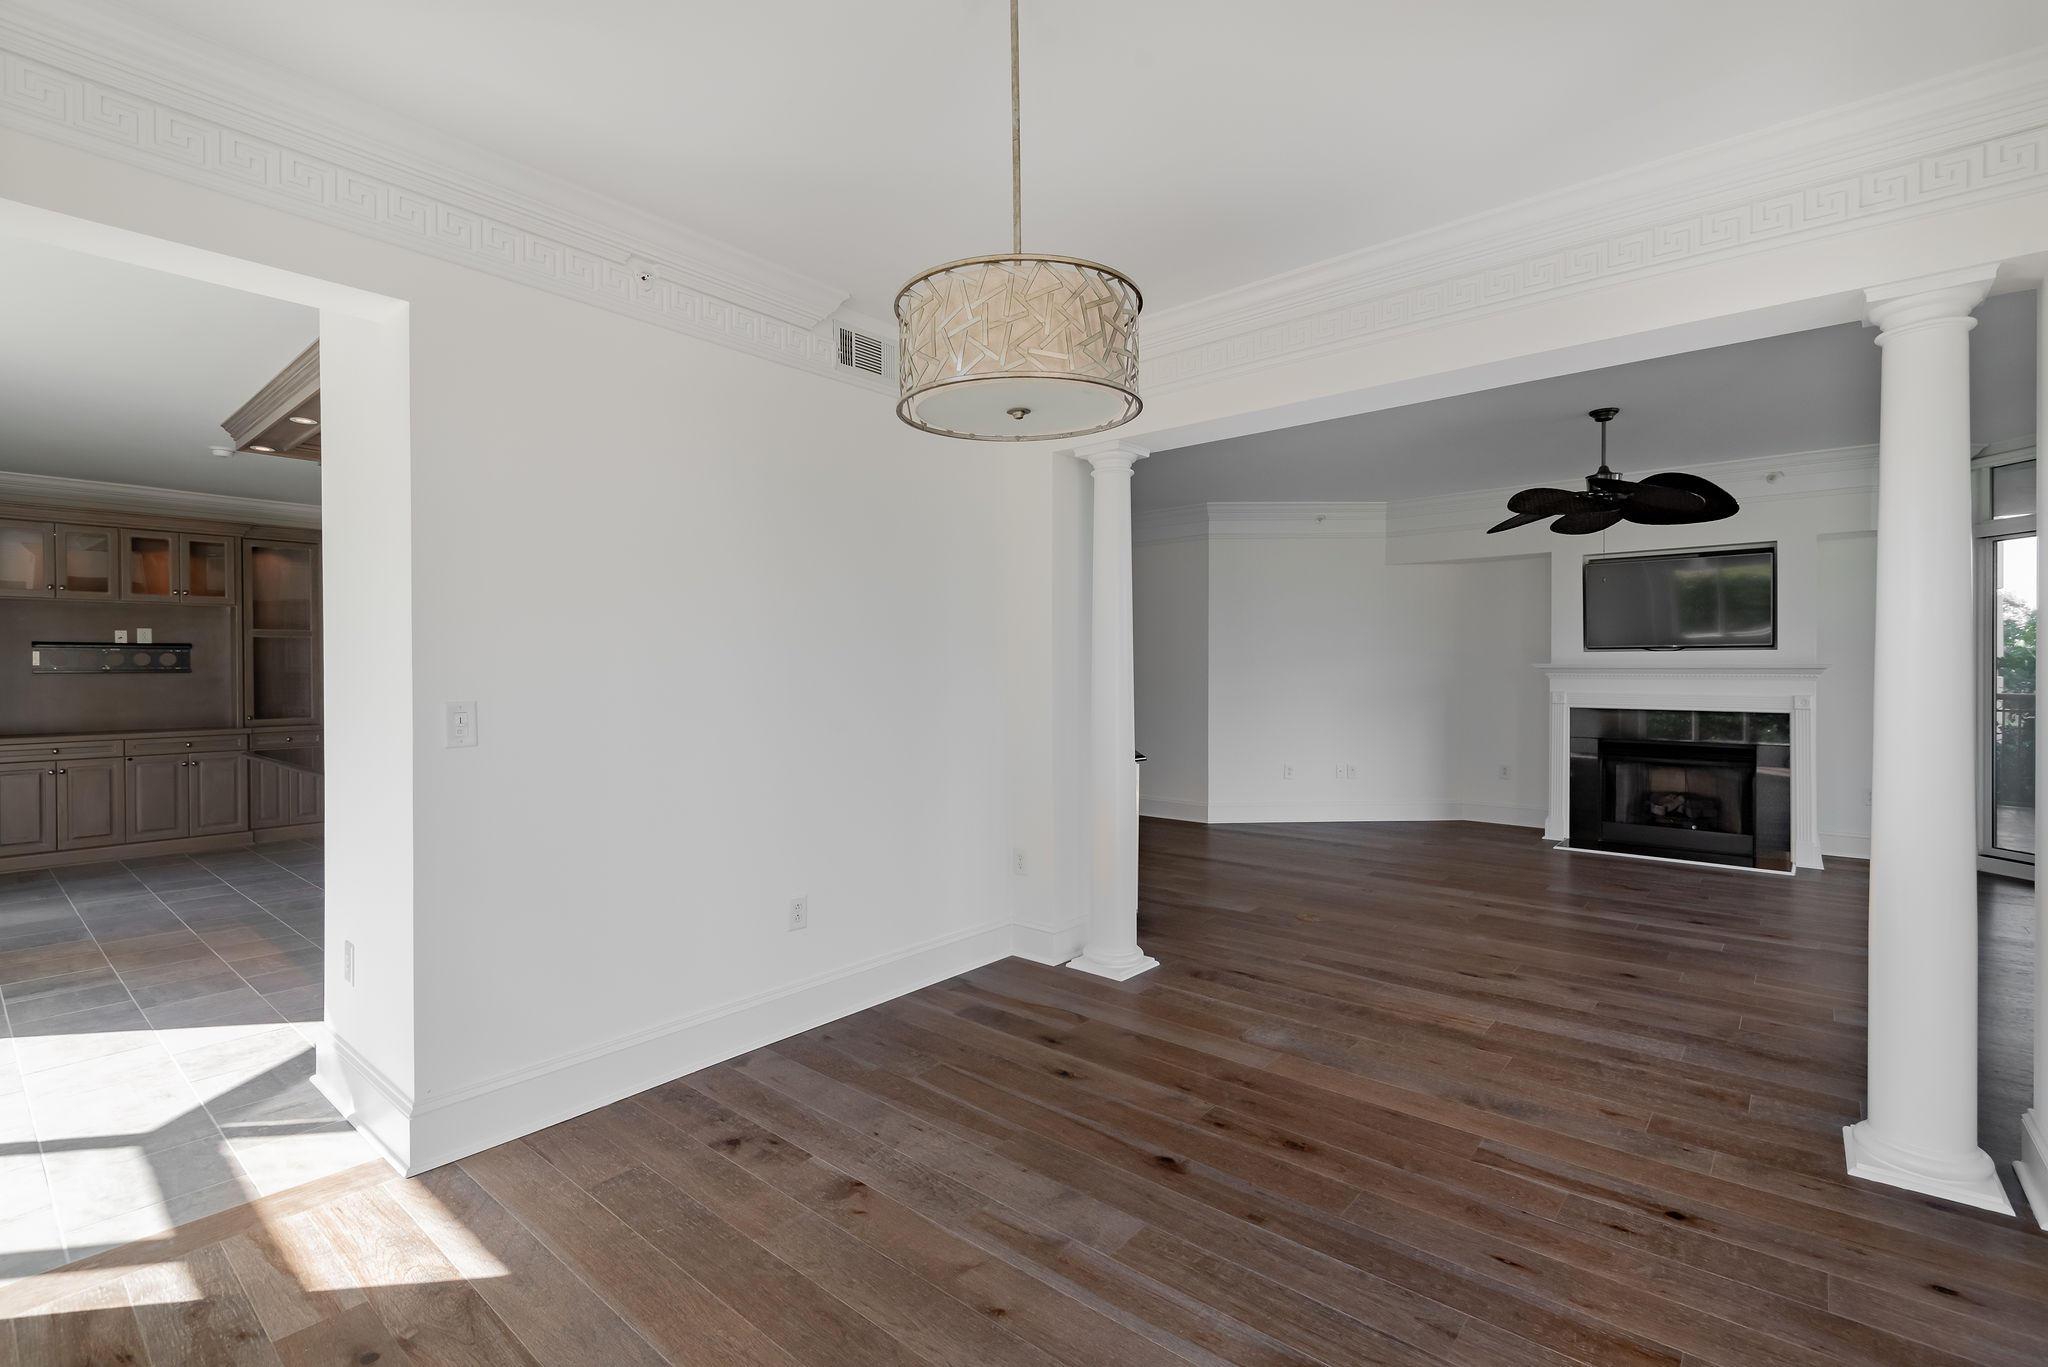 Renaissance On Chas Harbor Homes For Sale - 211 Plaza, Mount Pleasant, SC - 13